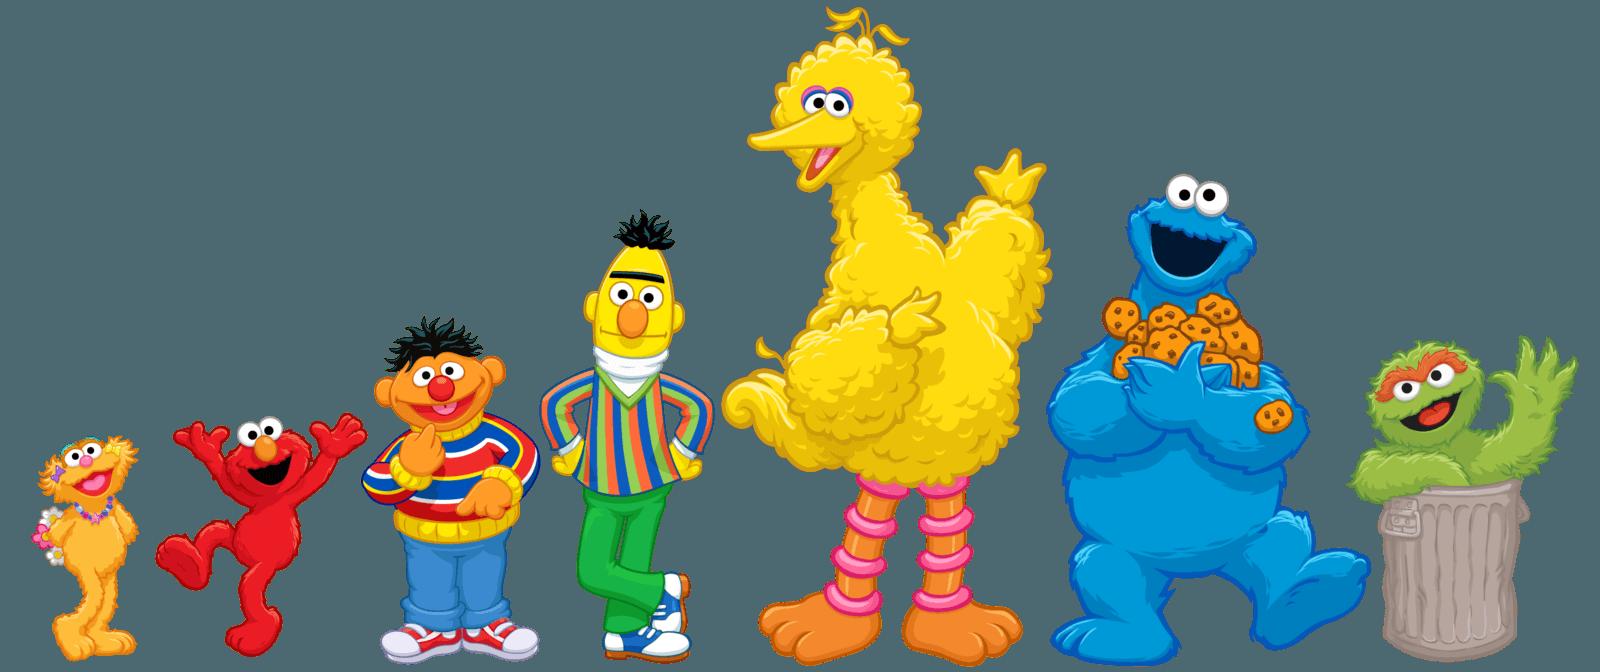 Sesame street characters clip. Elmo clipart big bird